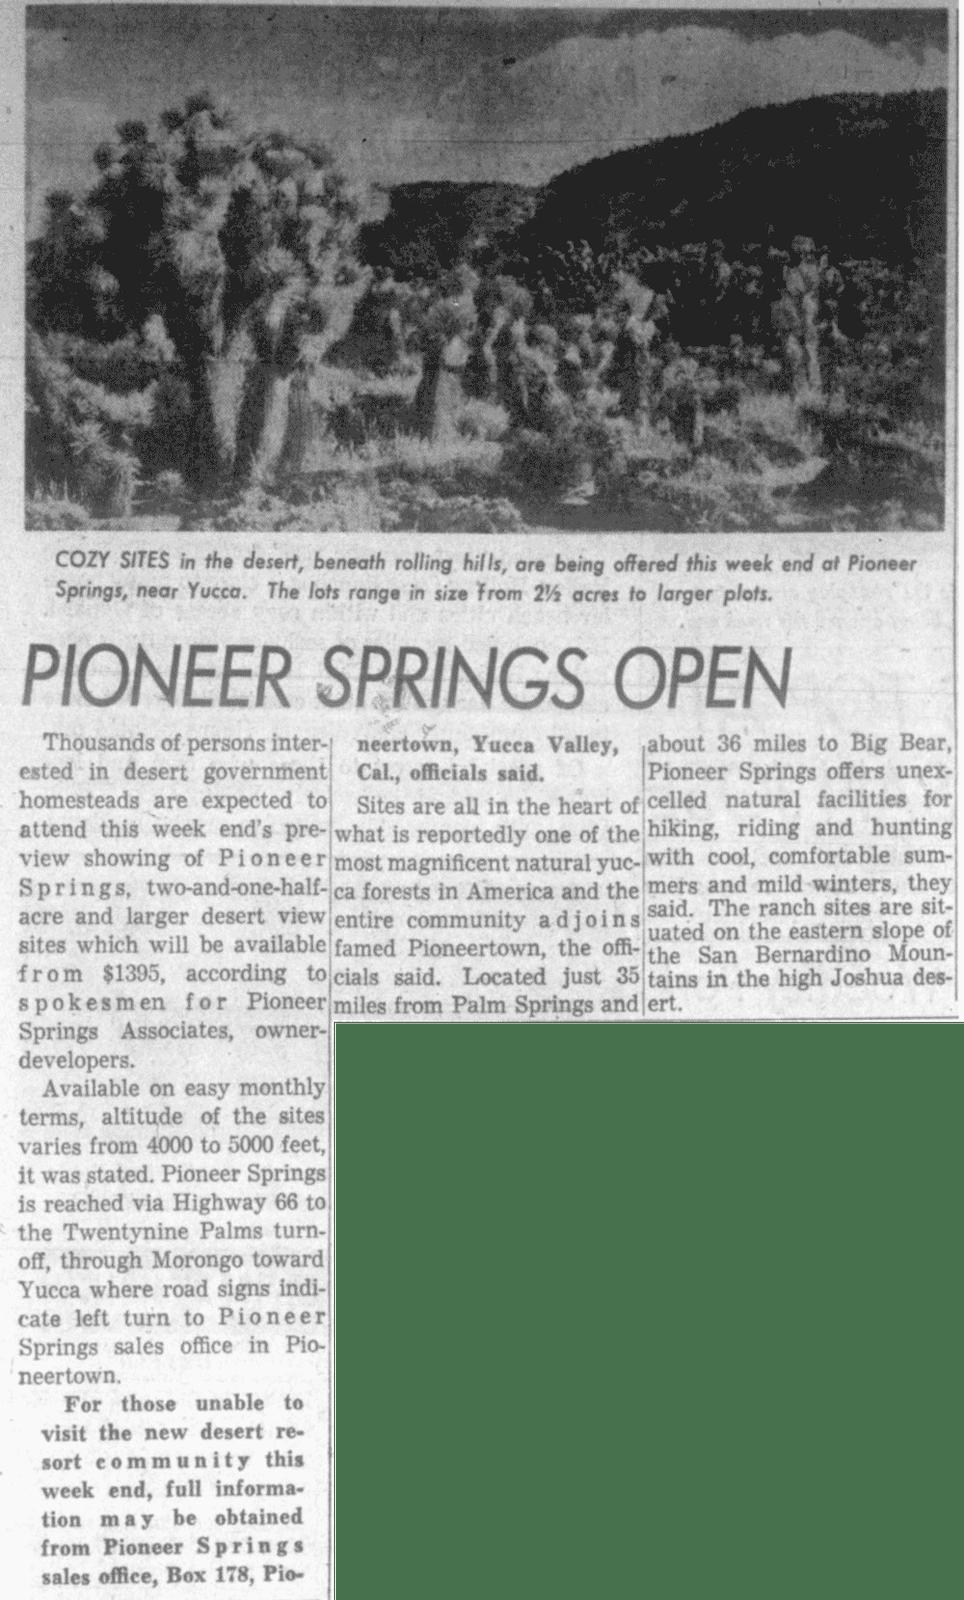 Apr. 12, 1957 - Mirror News clipping